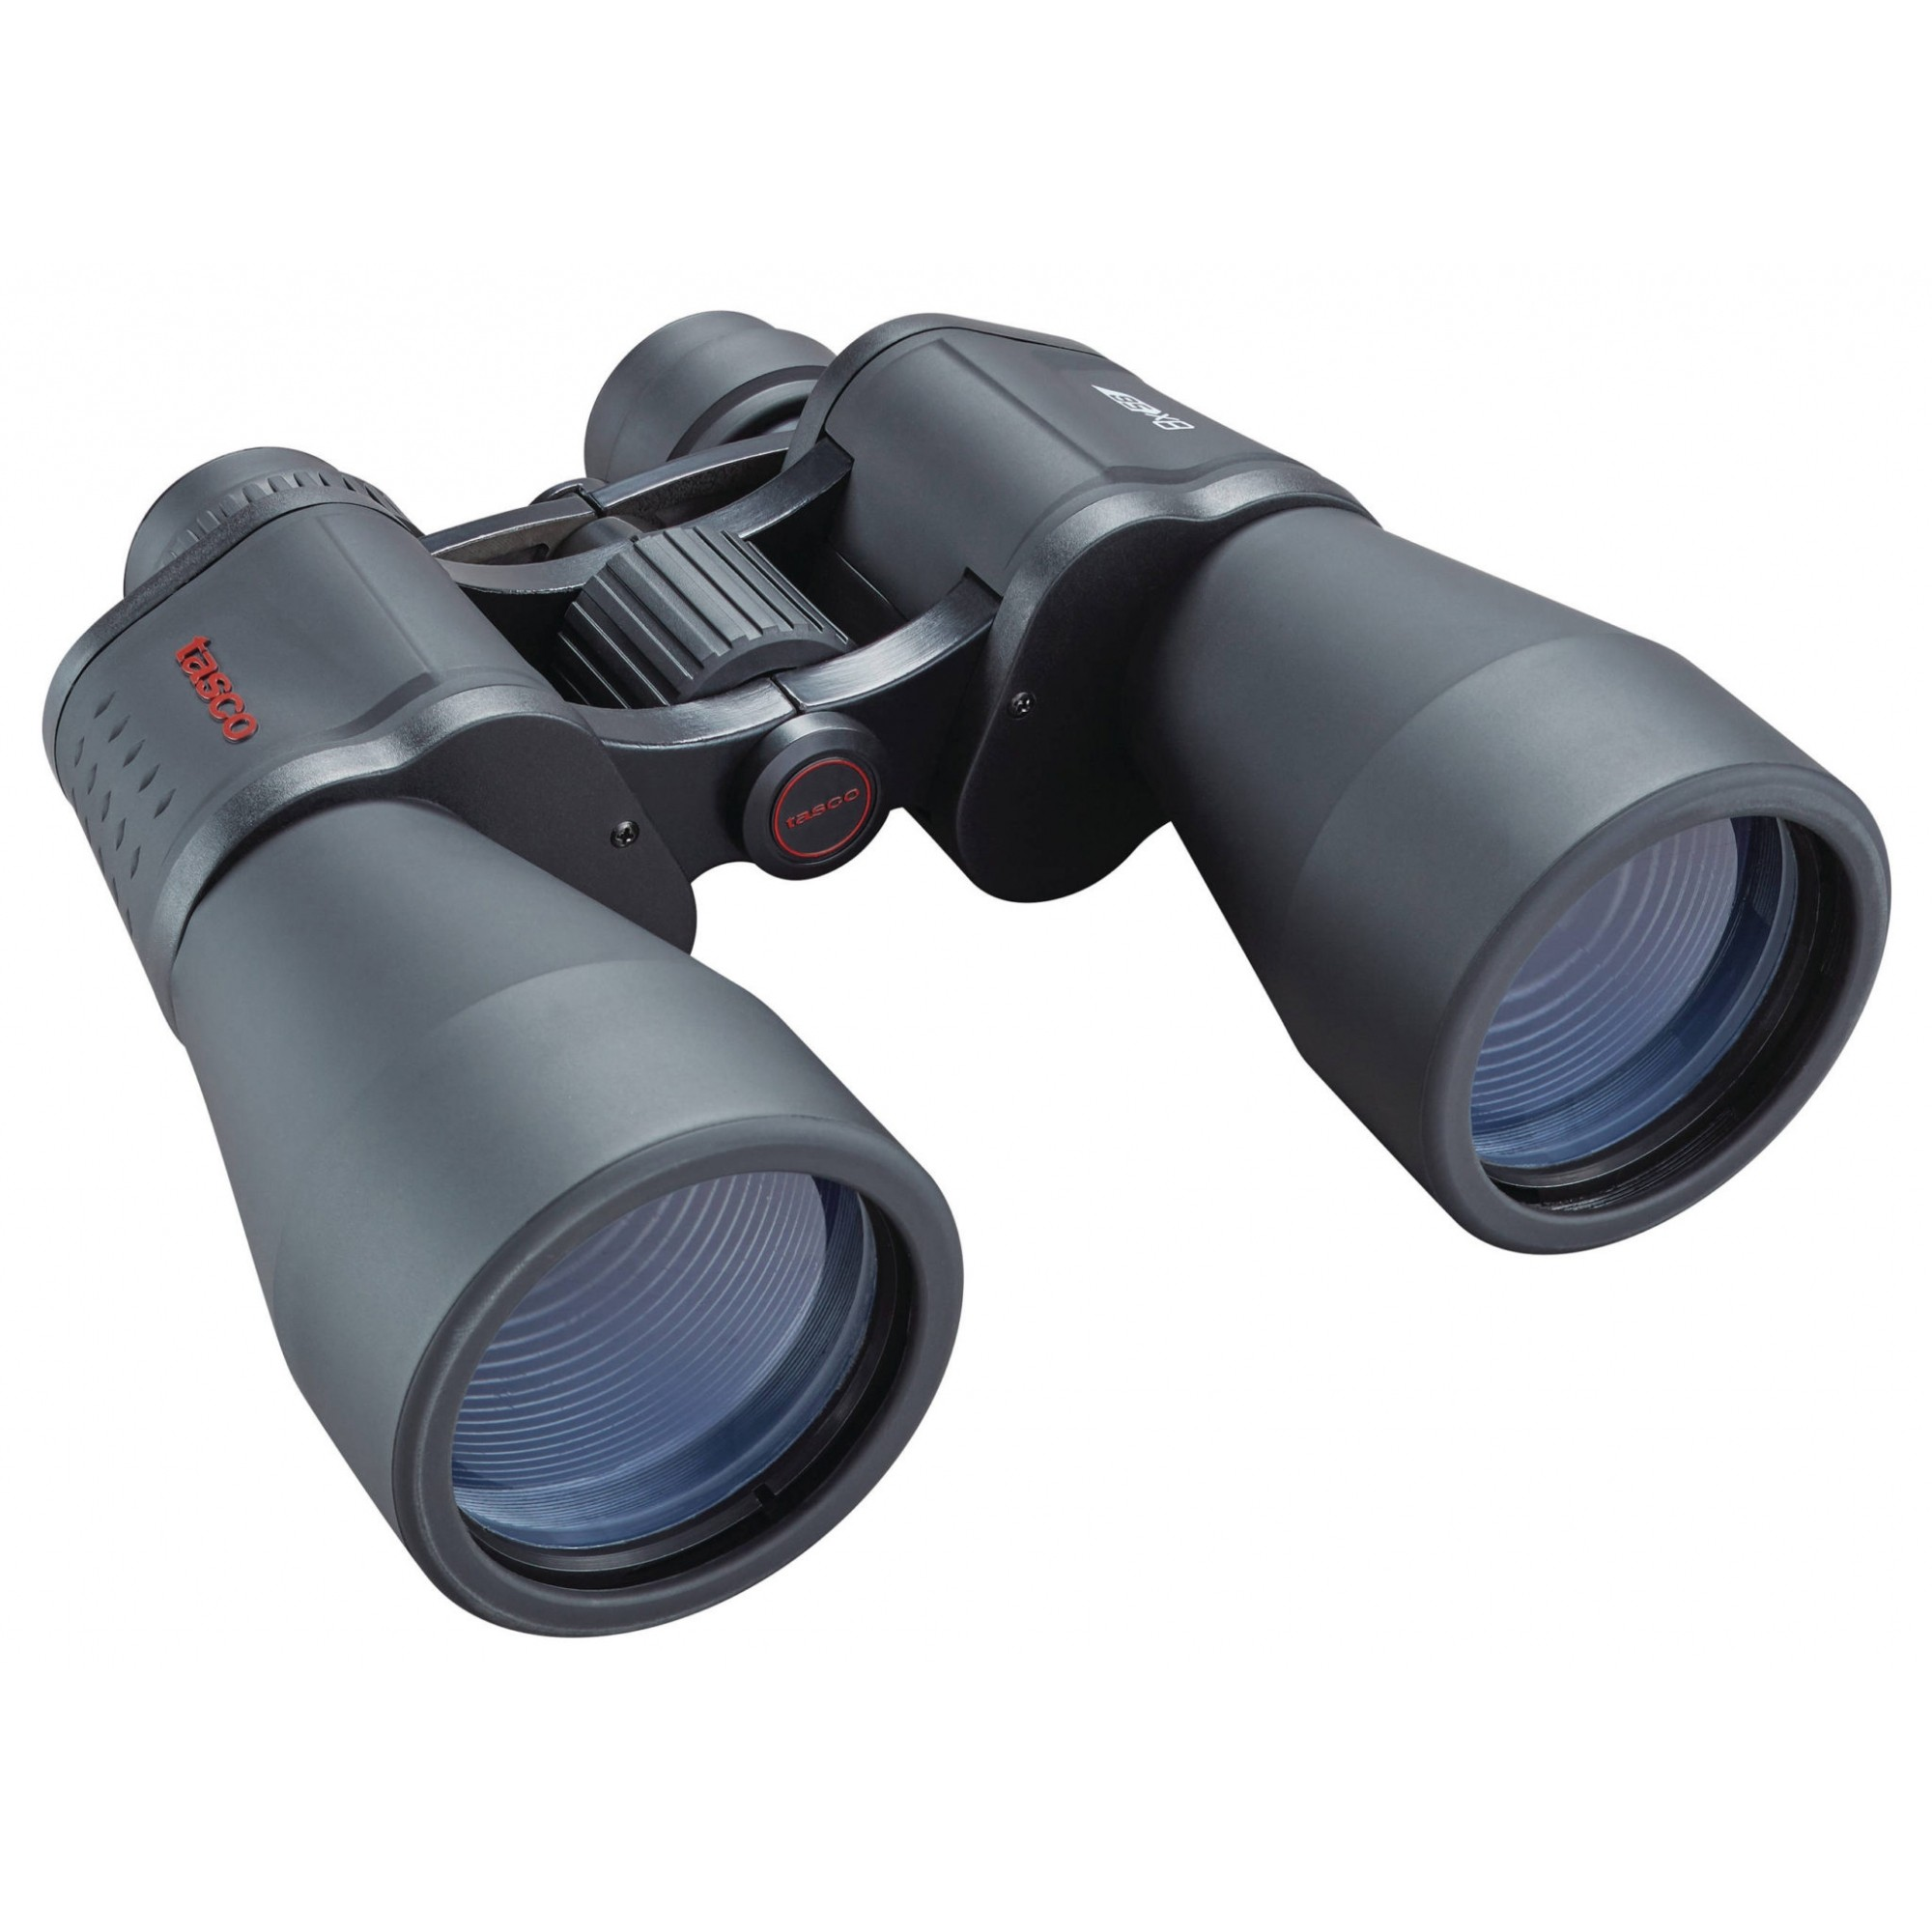 Binóculo 8x56mm prisma porro Essentials Tasco ES8x56  - Mix Eletro